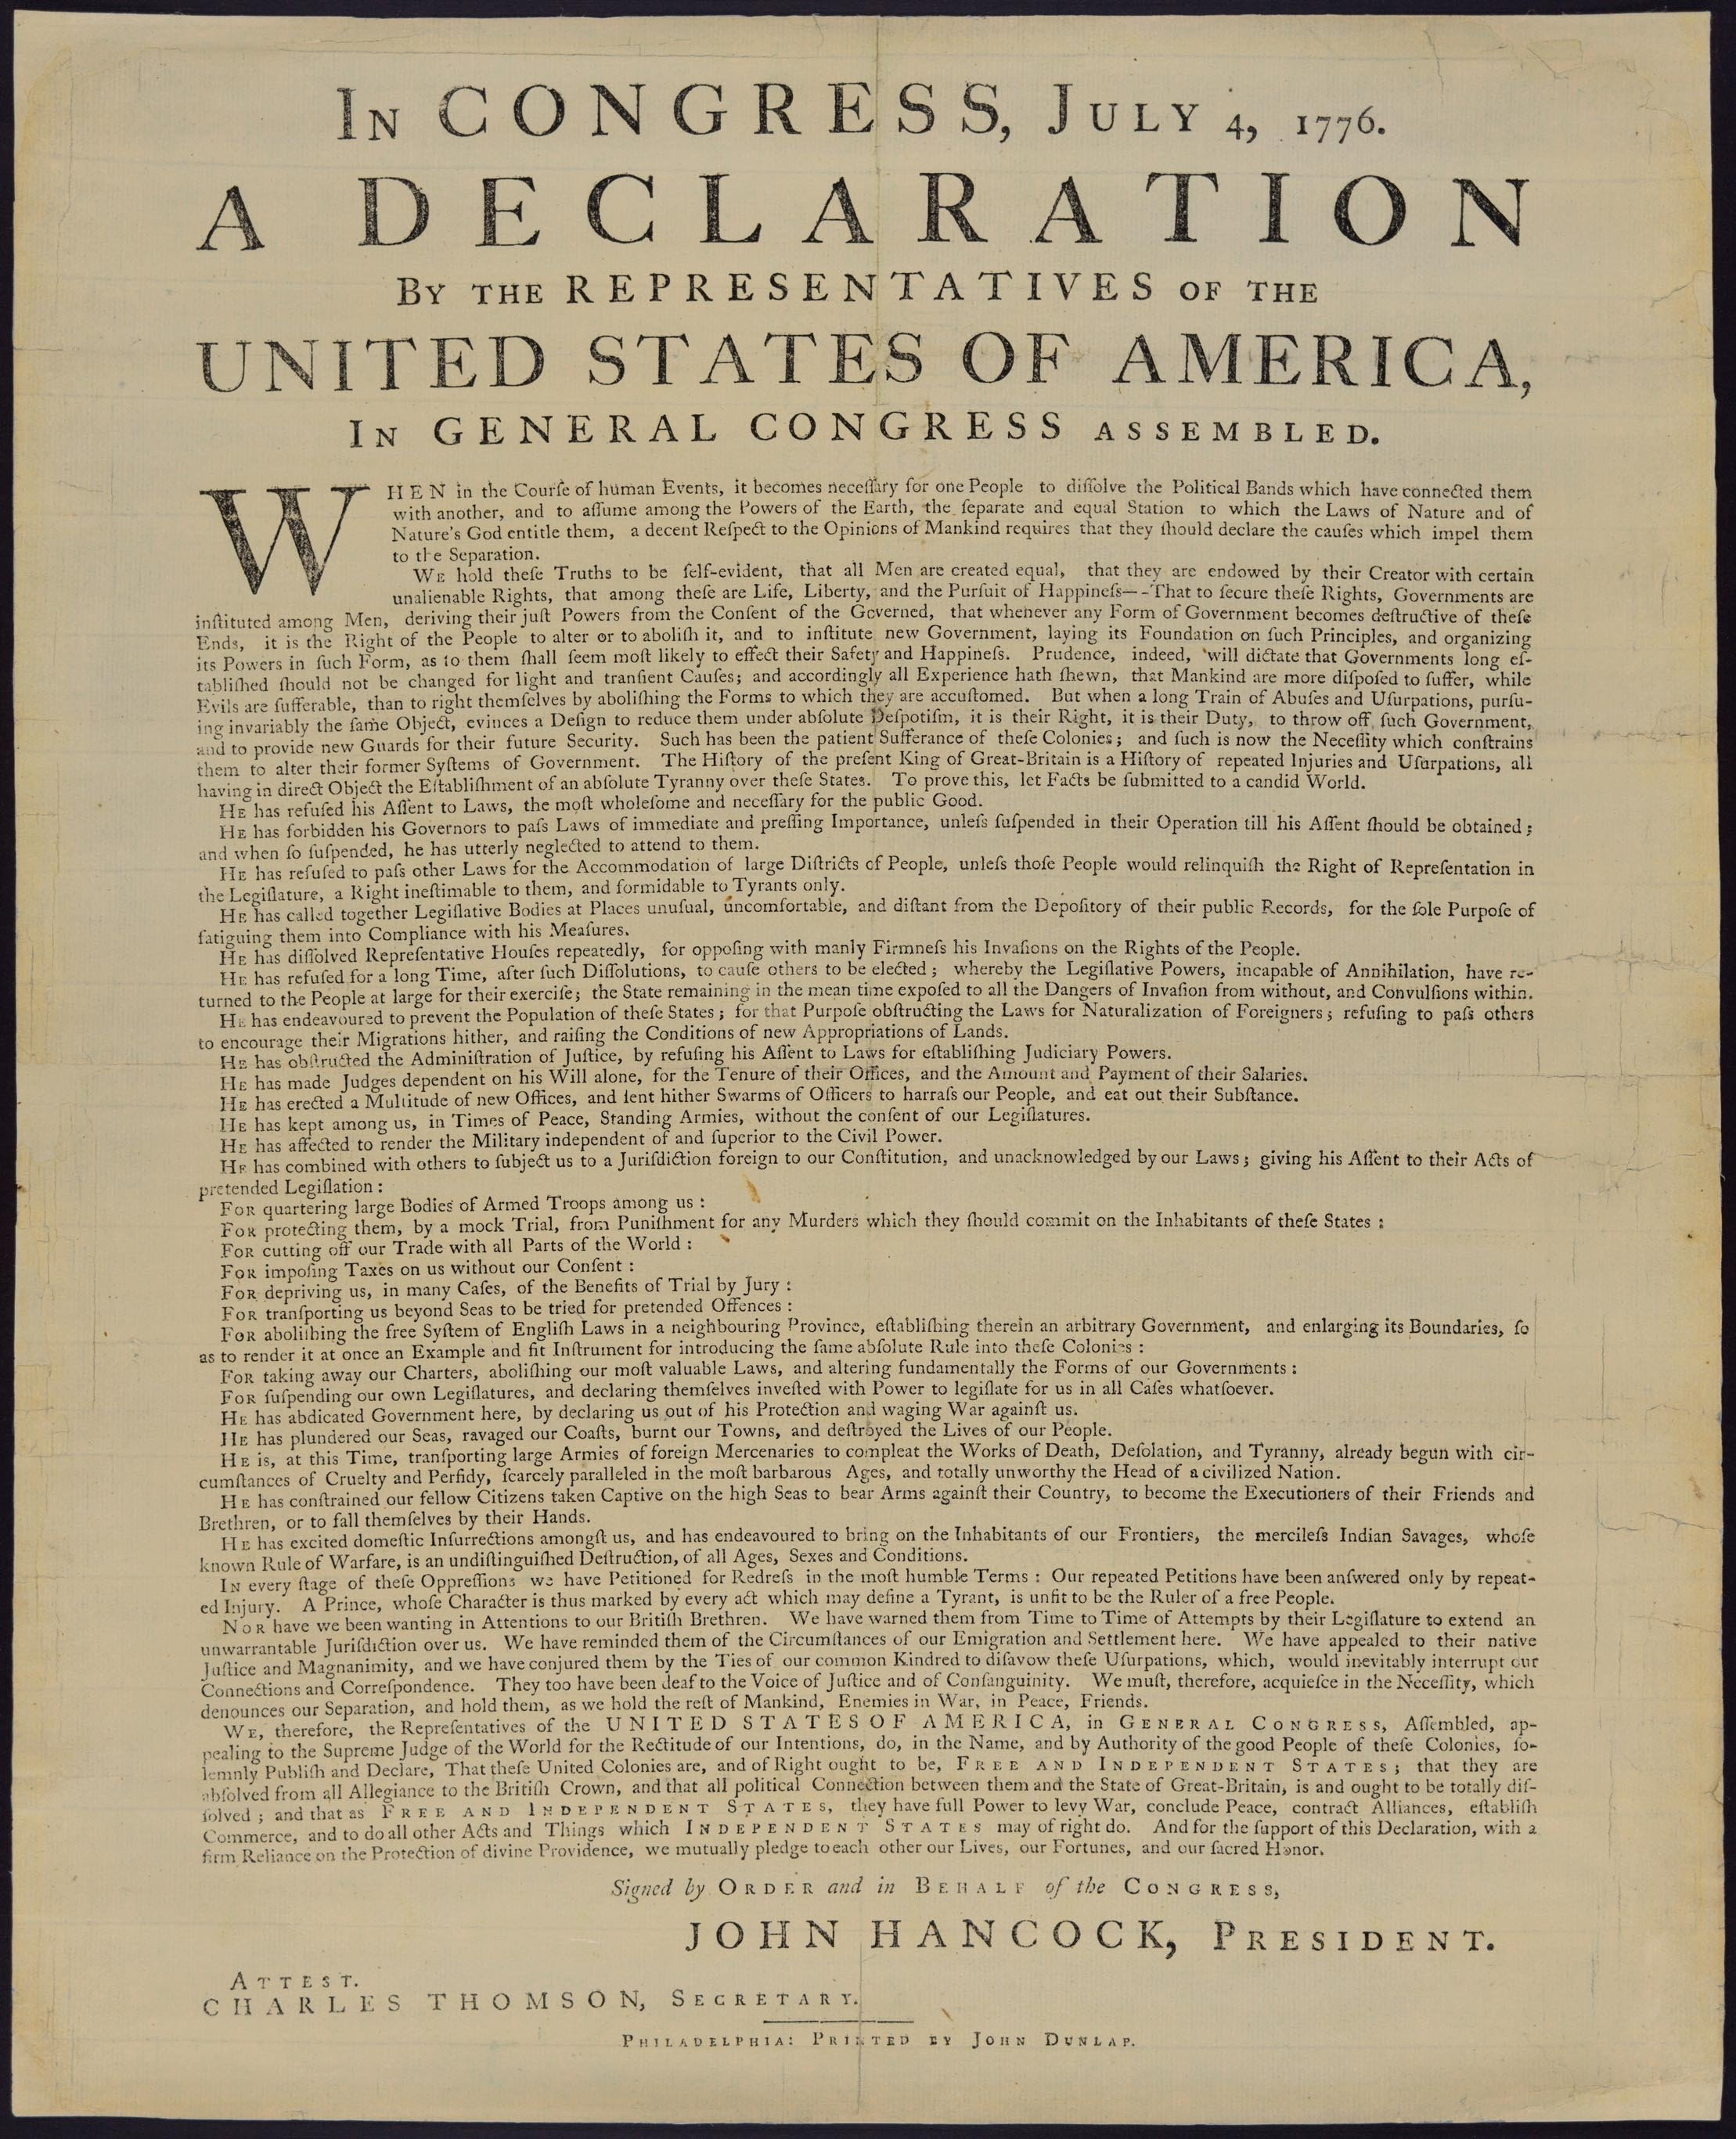 10 Lovable Main Idea Of Declaration Of Independence troubling the u s declaration of independence groundviews 2020